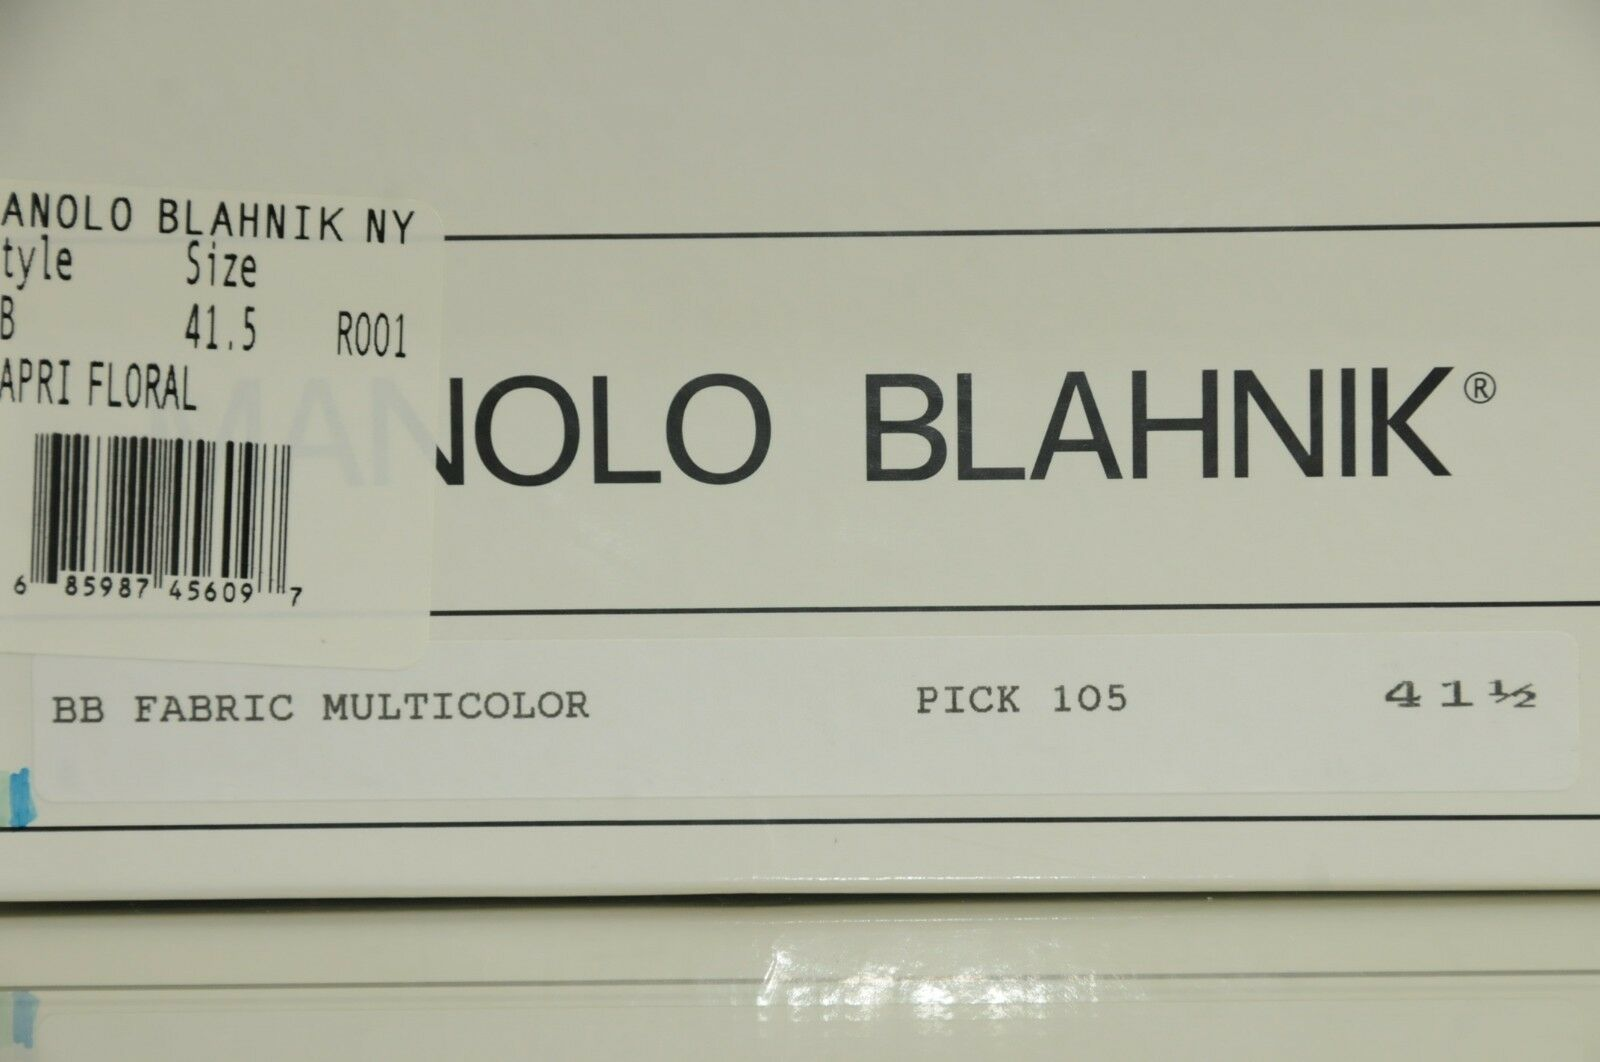 New Manolo Blahnik Blahnik Blahnik BB 105 Black Green bluee FLORAL CAPRI Pumps 38.5 39.5 41.5 d875c5